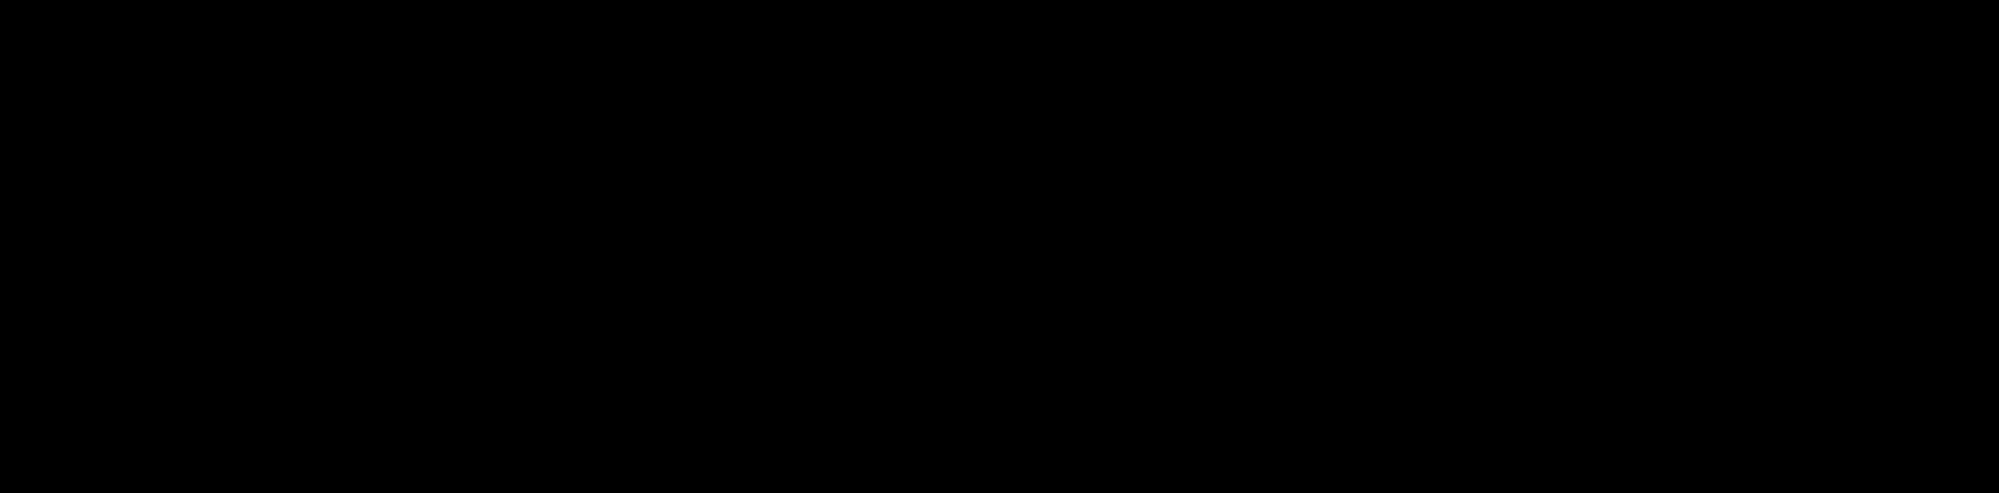 image168.png